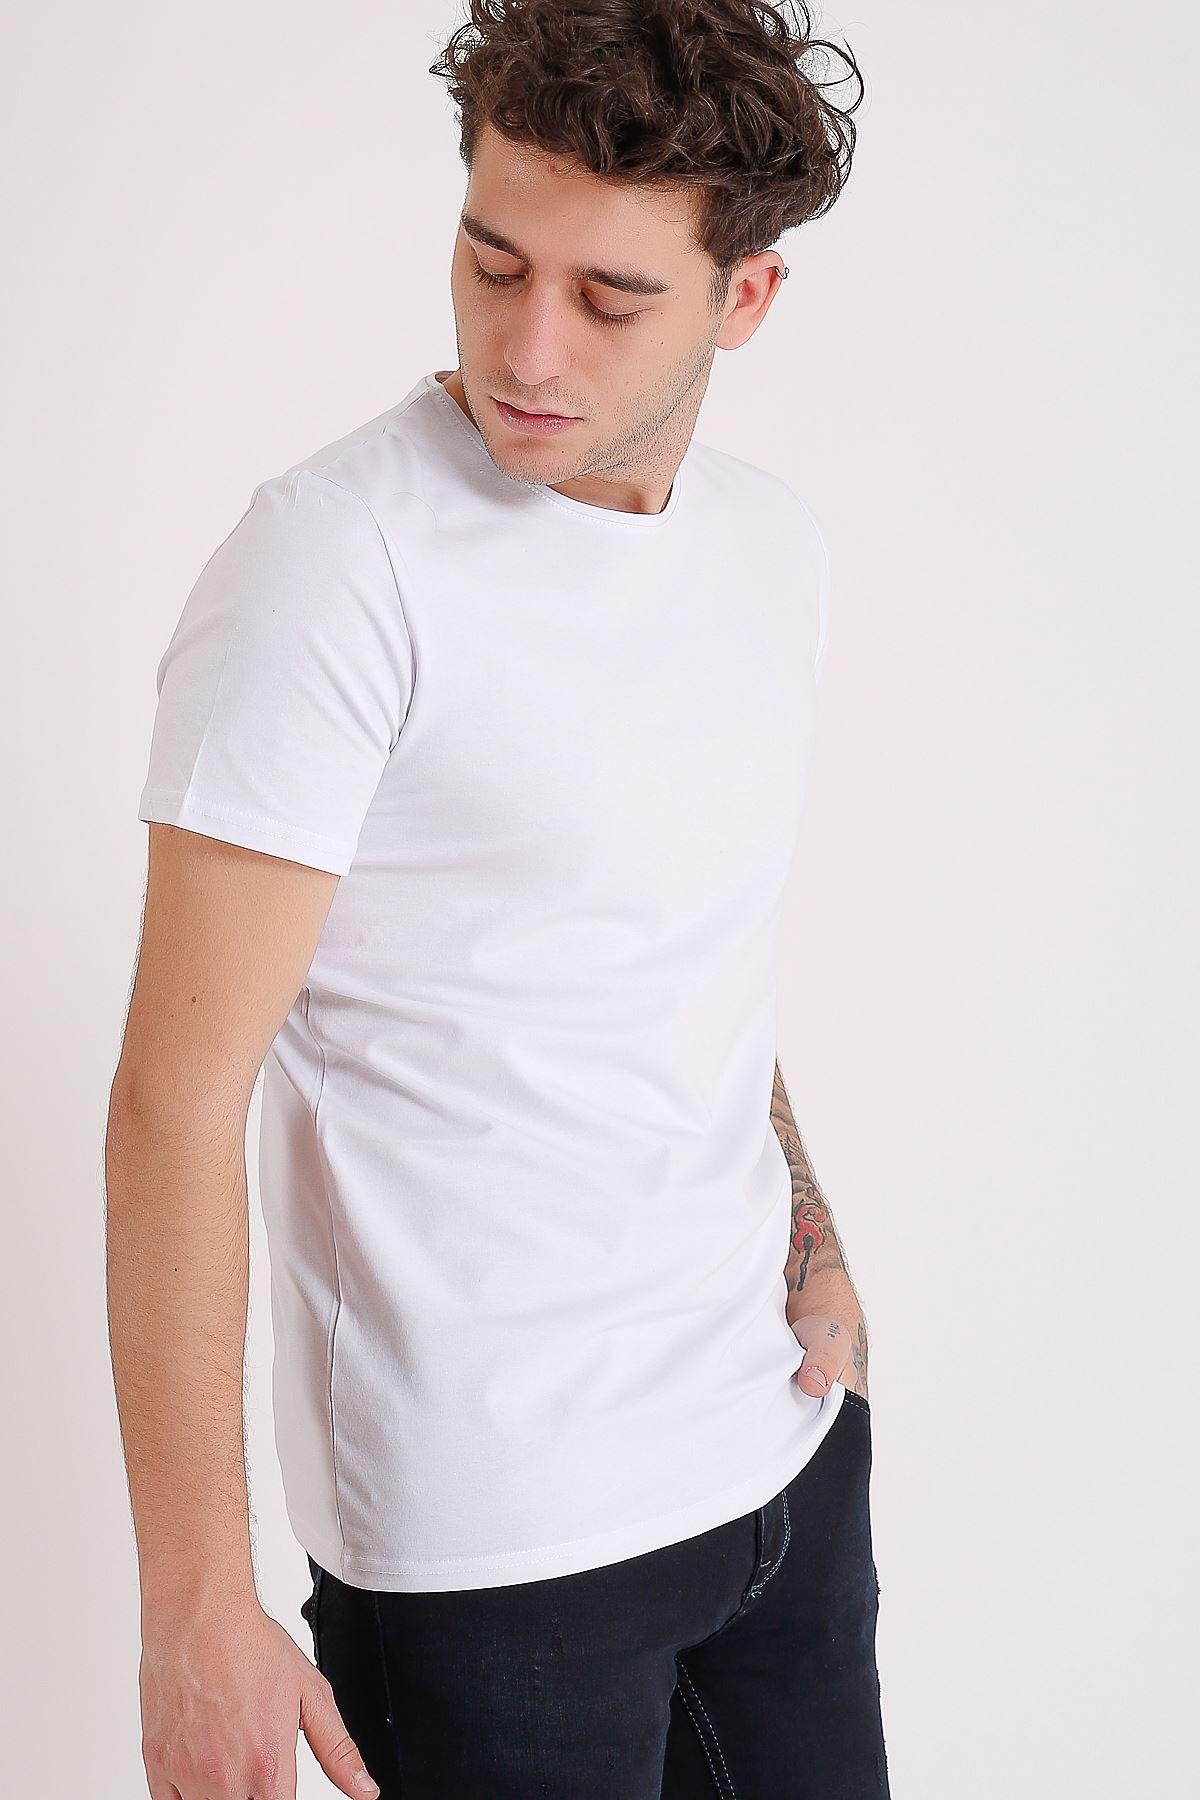 Bisiklet Yaka Basic Beyaz Erkek T-Shirt